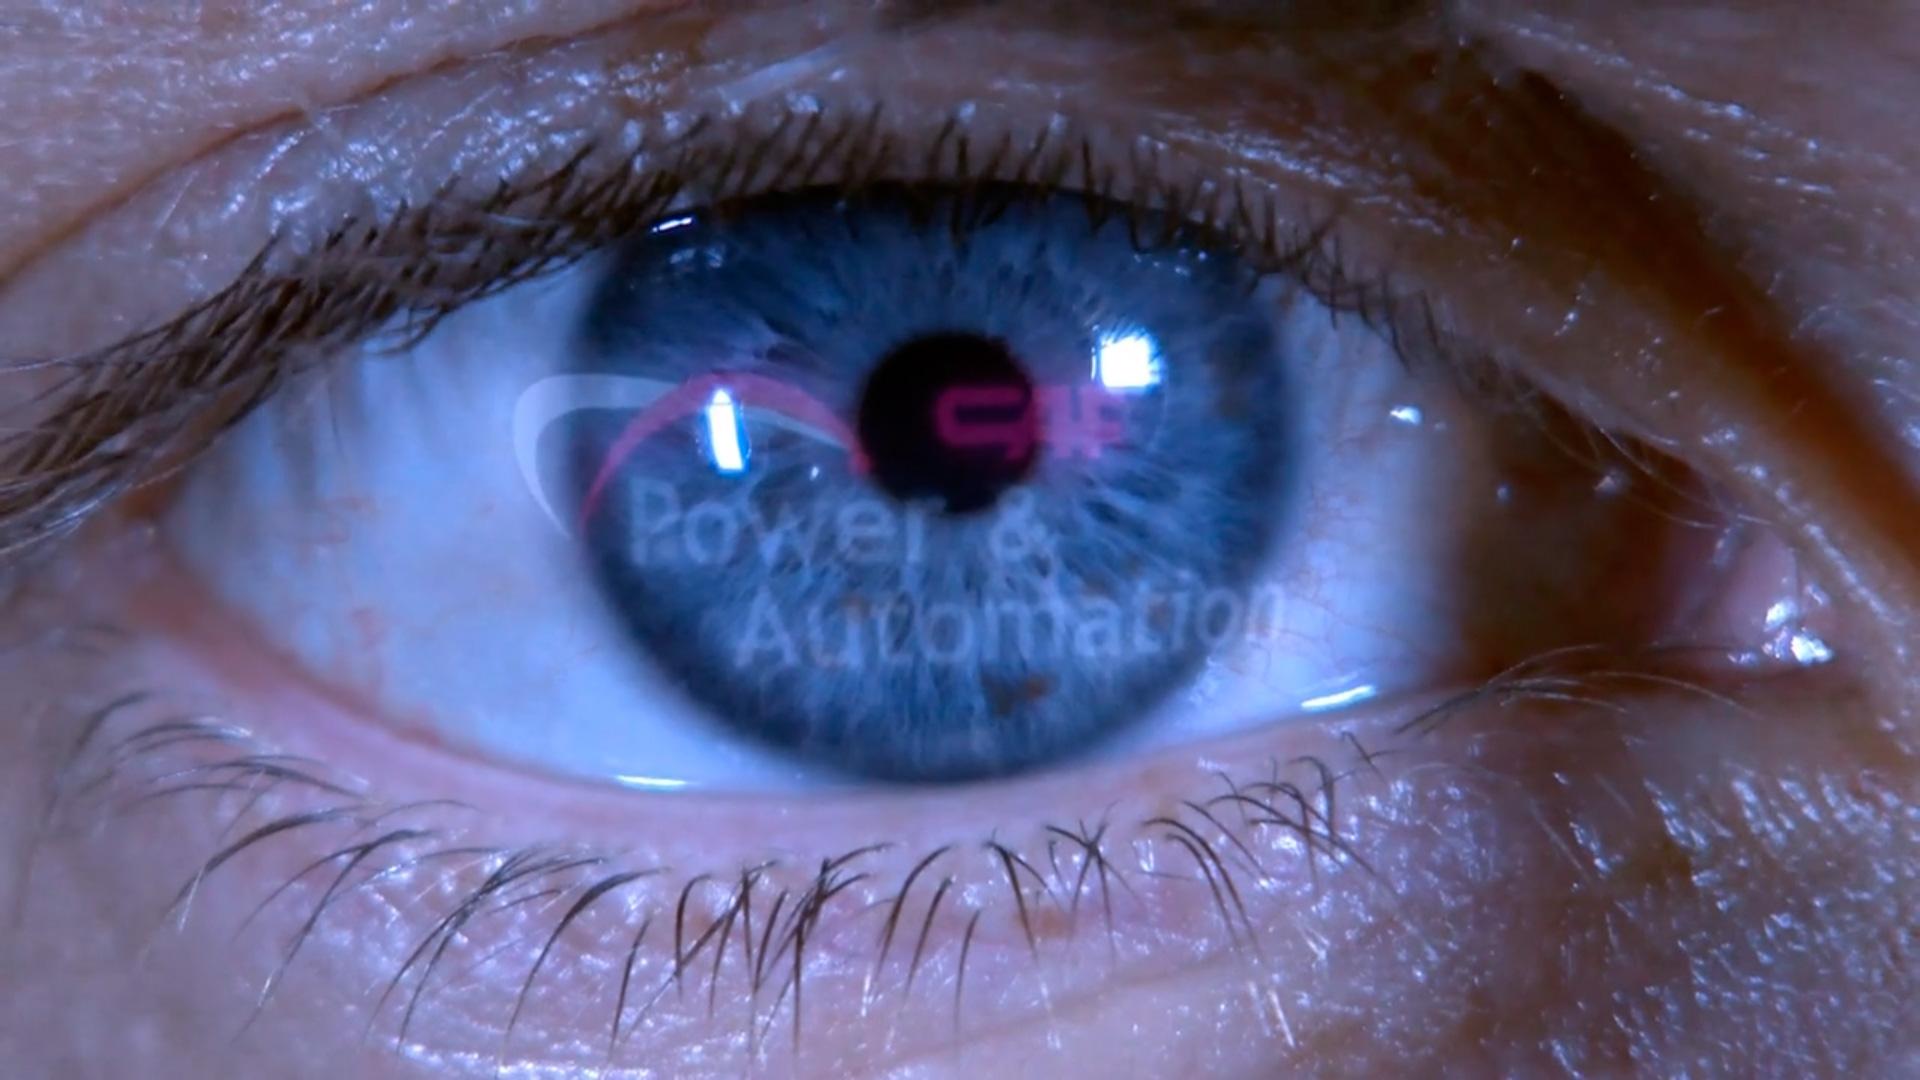 Vídeo corporativo empresa Caf Power & Automation